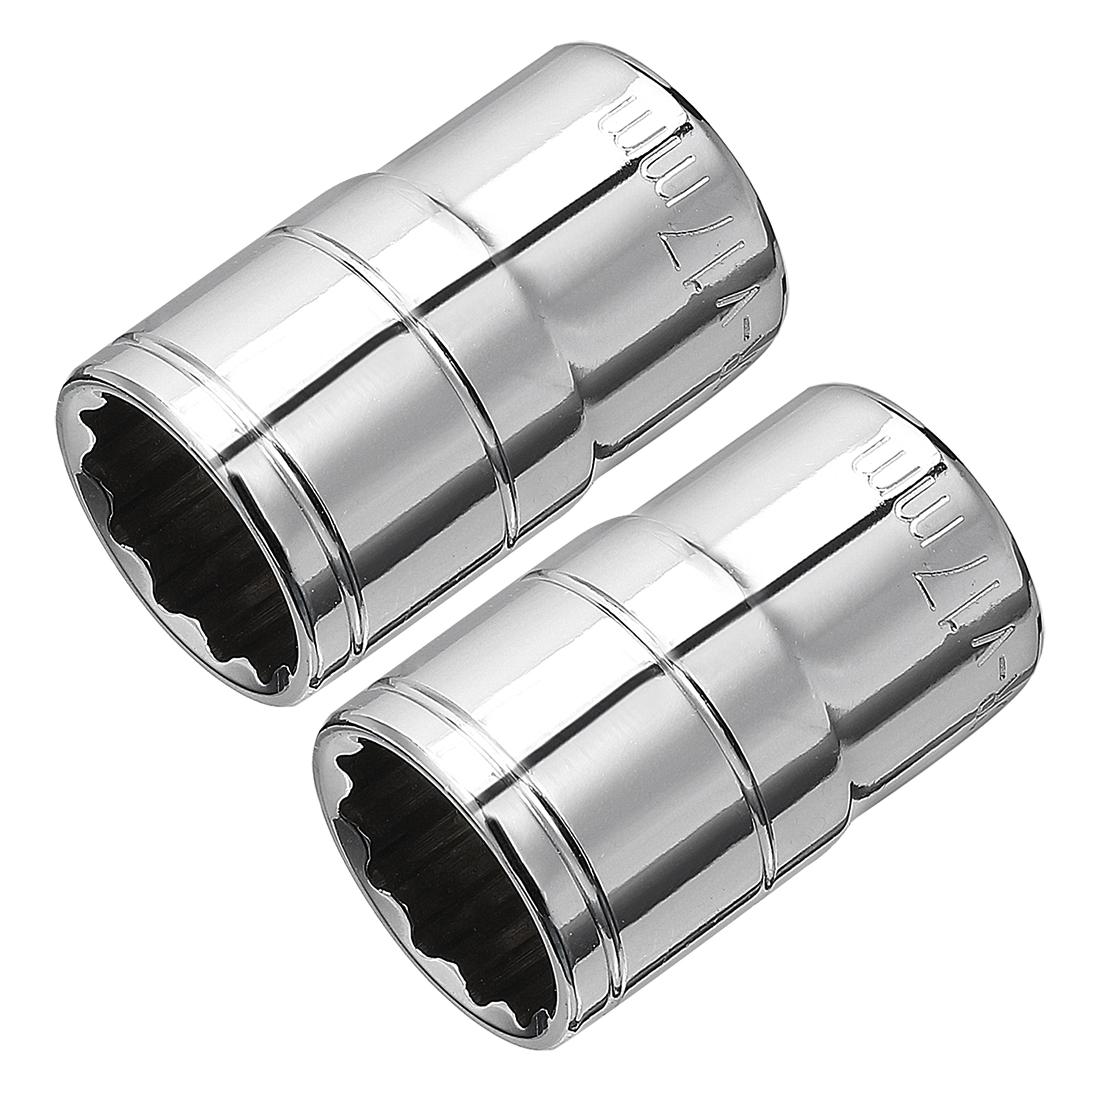 2Pcs 1/2-inch Drive 17mm Cr-V 12-Point Shallow Socket